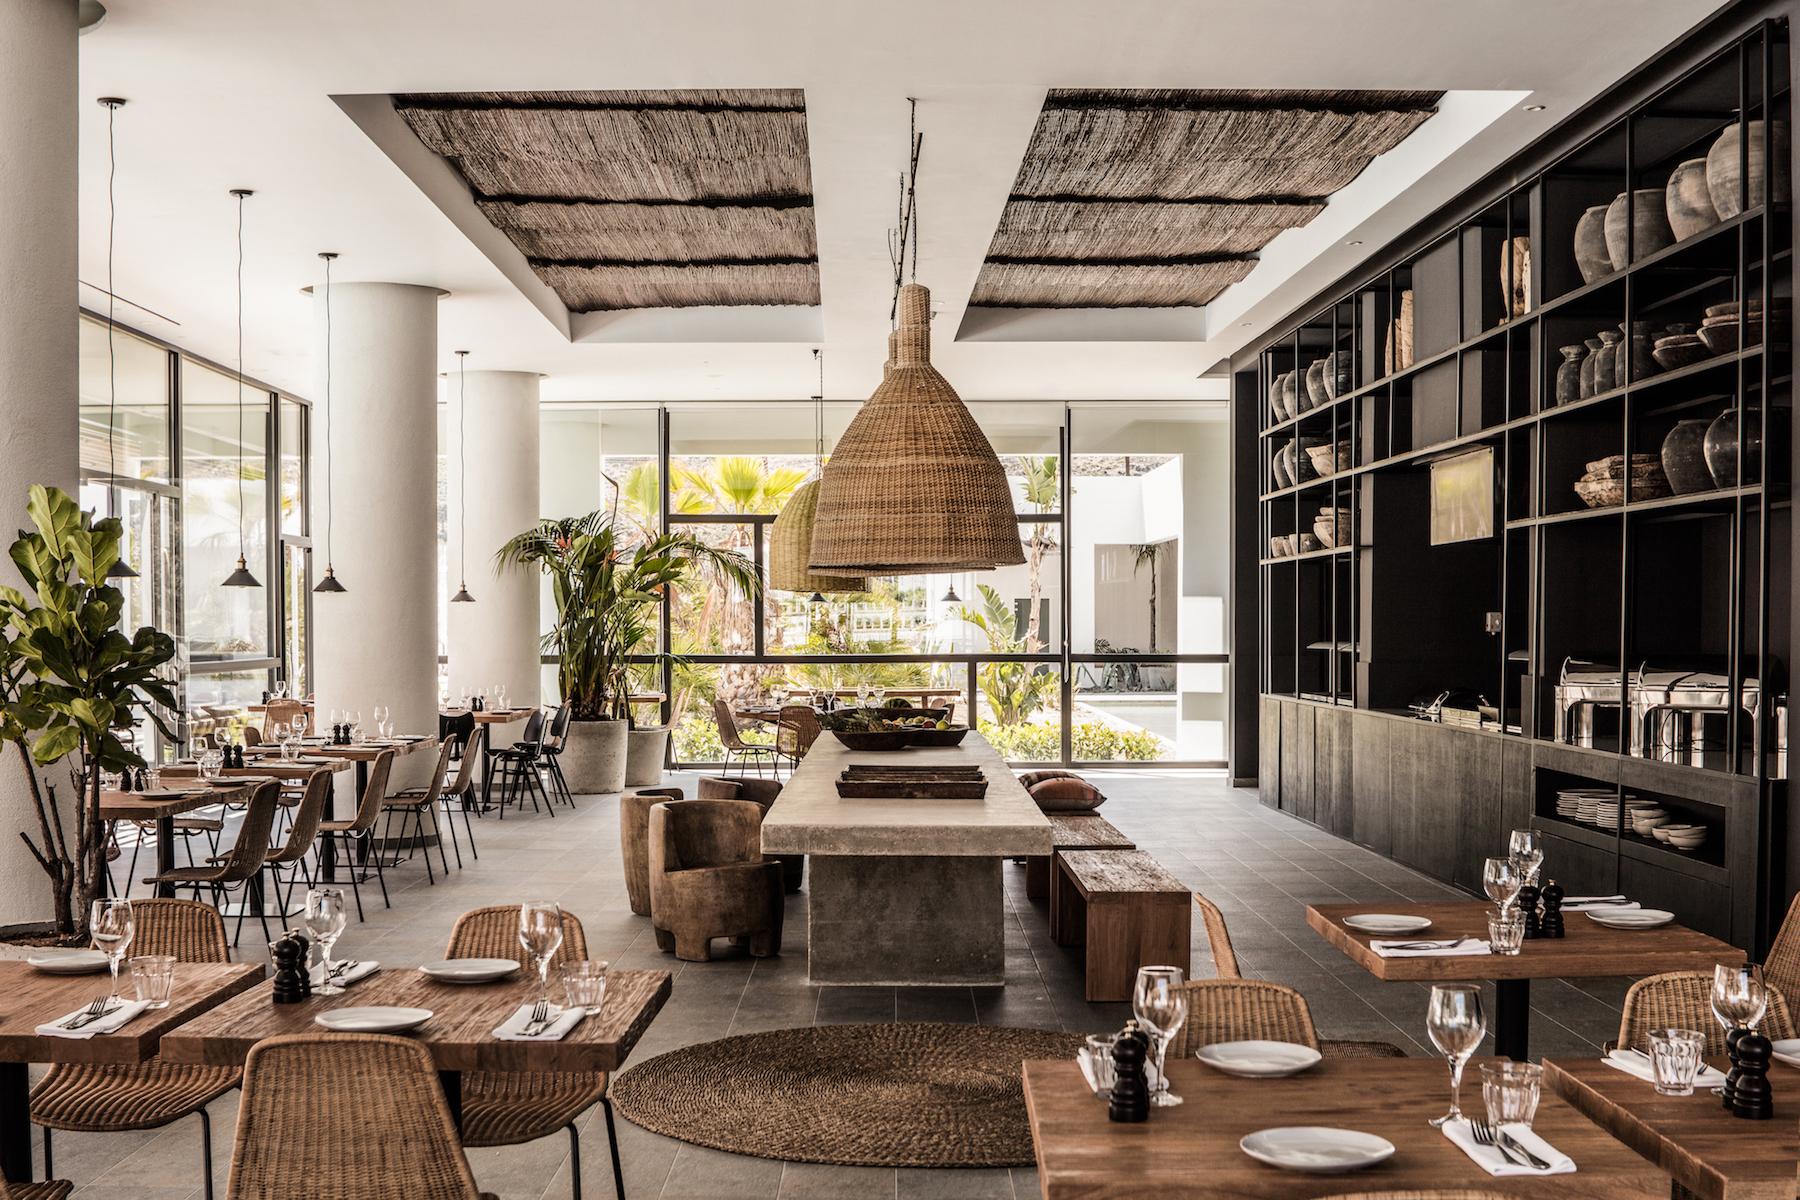 Casa-Cook_Rhodos_Greece∏Georg-Roske_013-A3.jpg